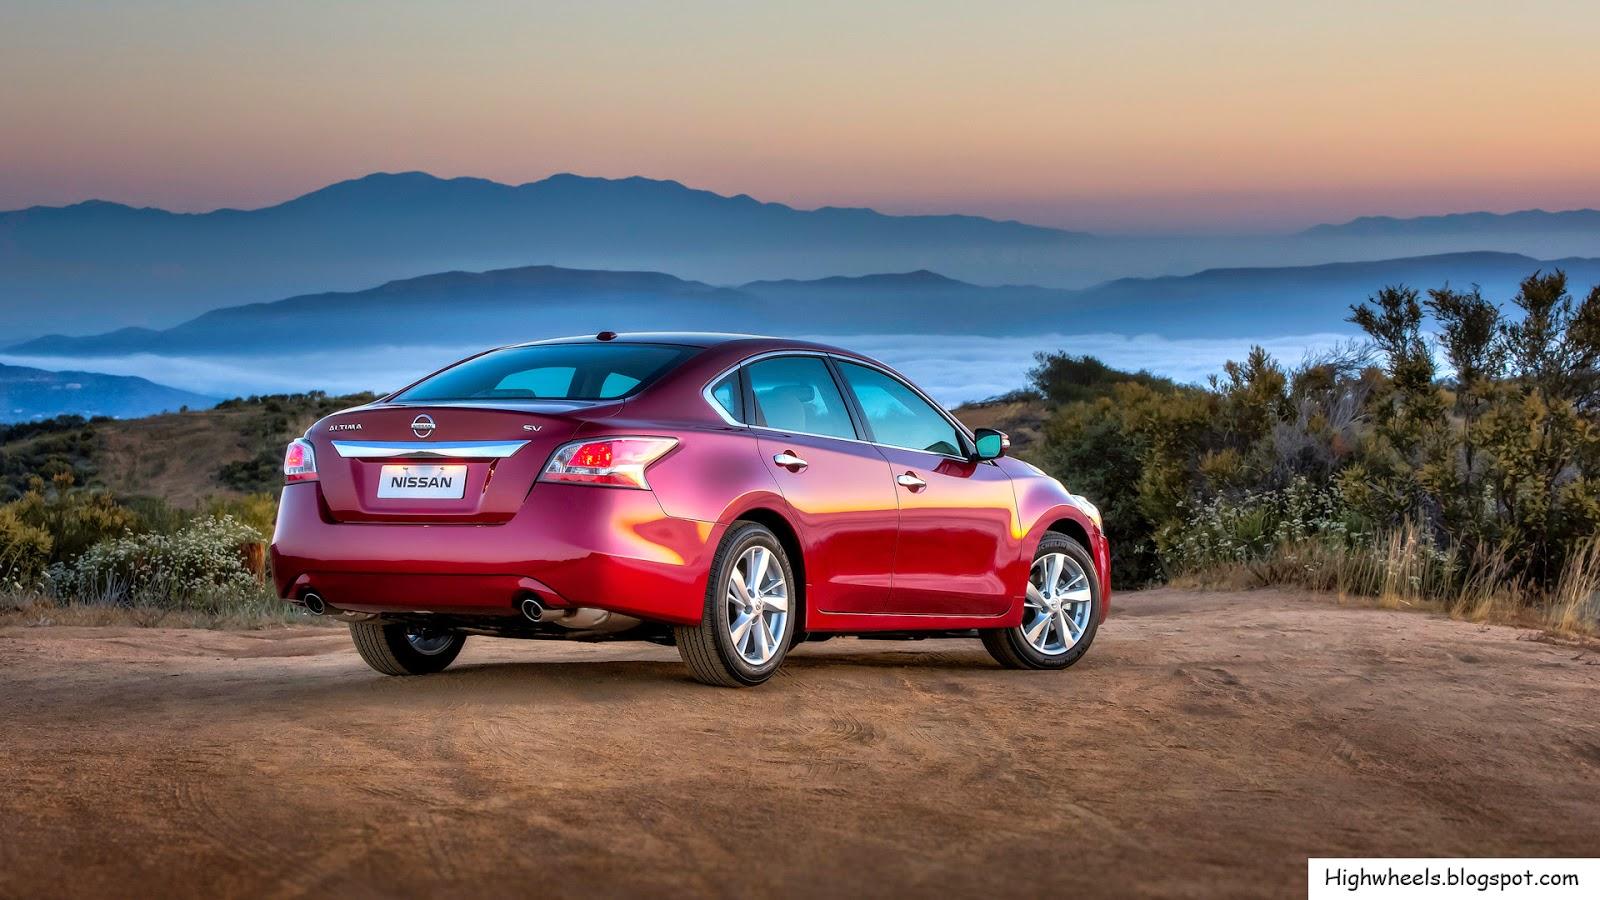 2015 Nissan Altima 2.5 Sv >> 2015 Nissan Altima - High Wheels